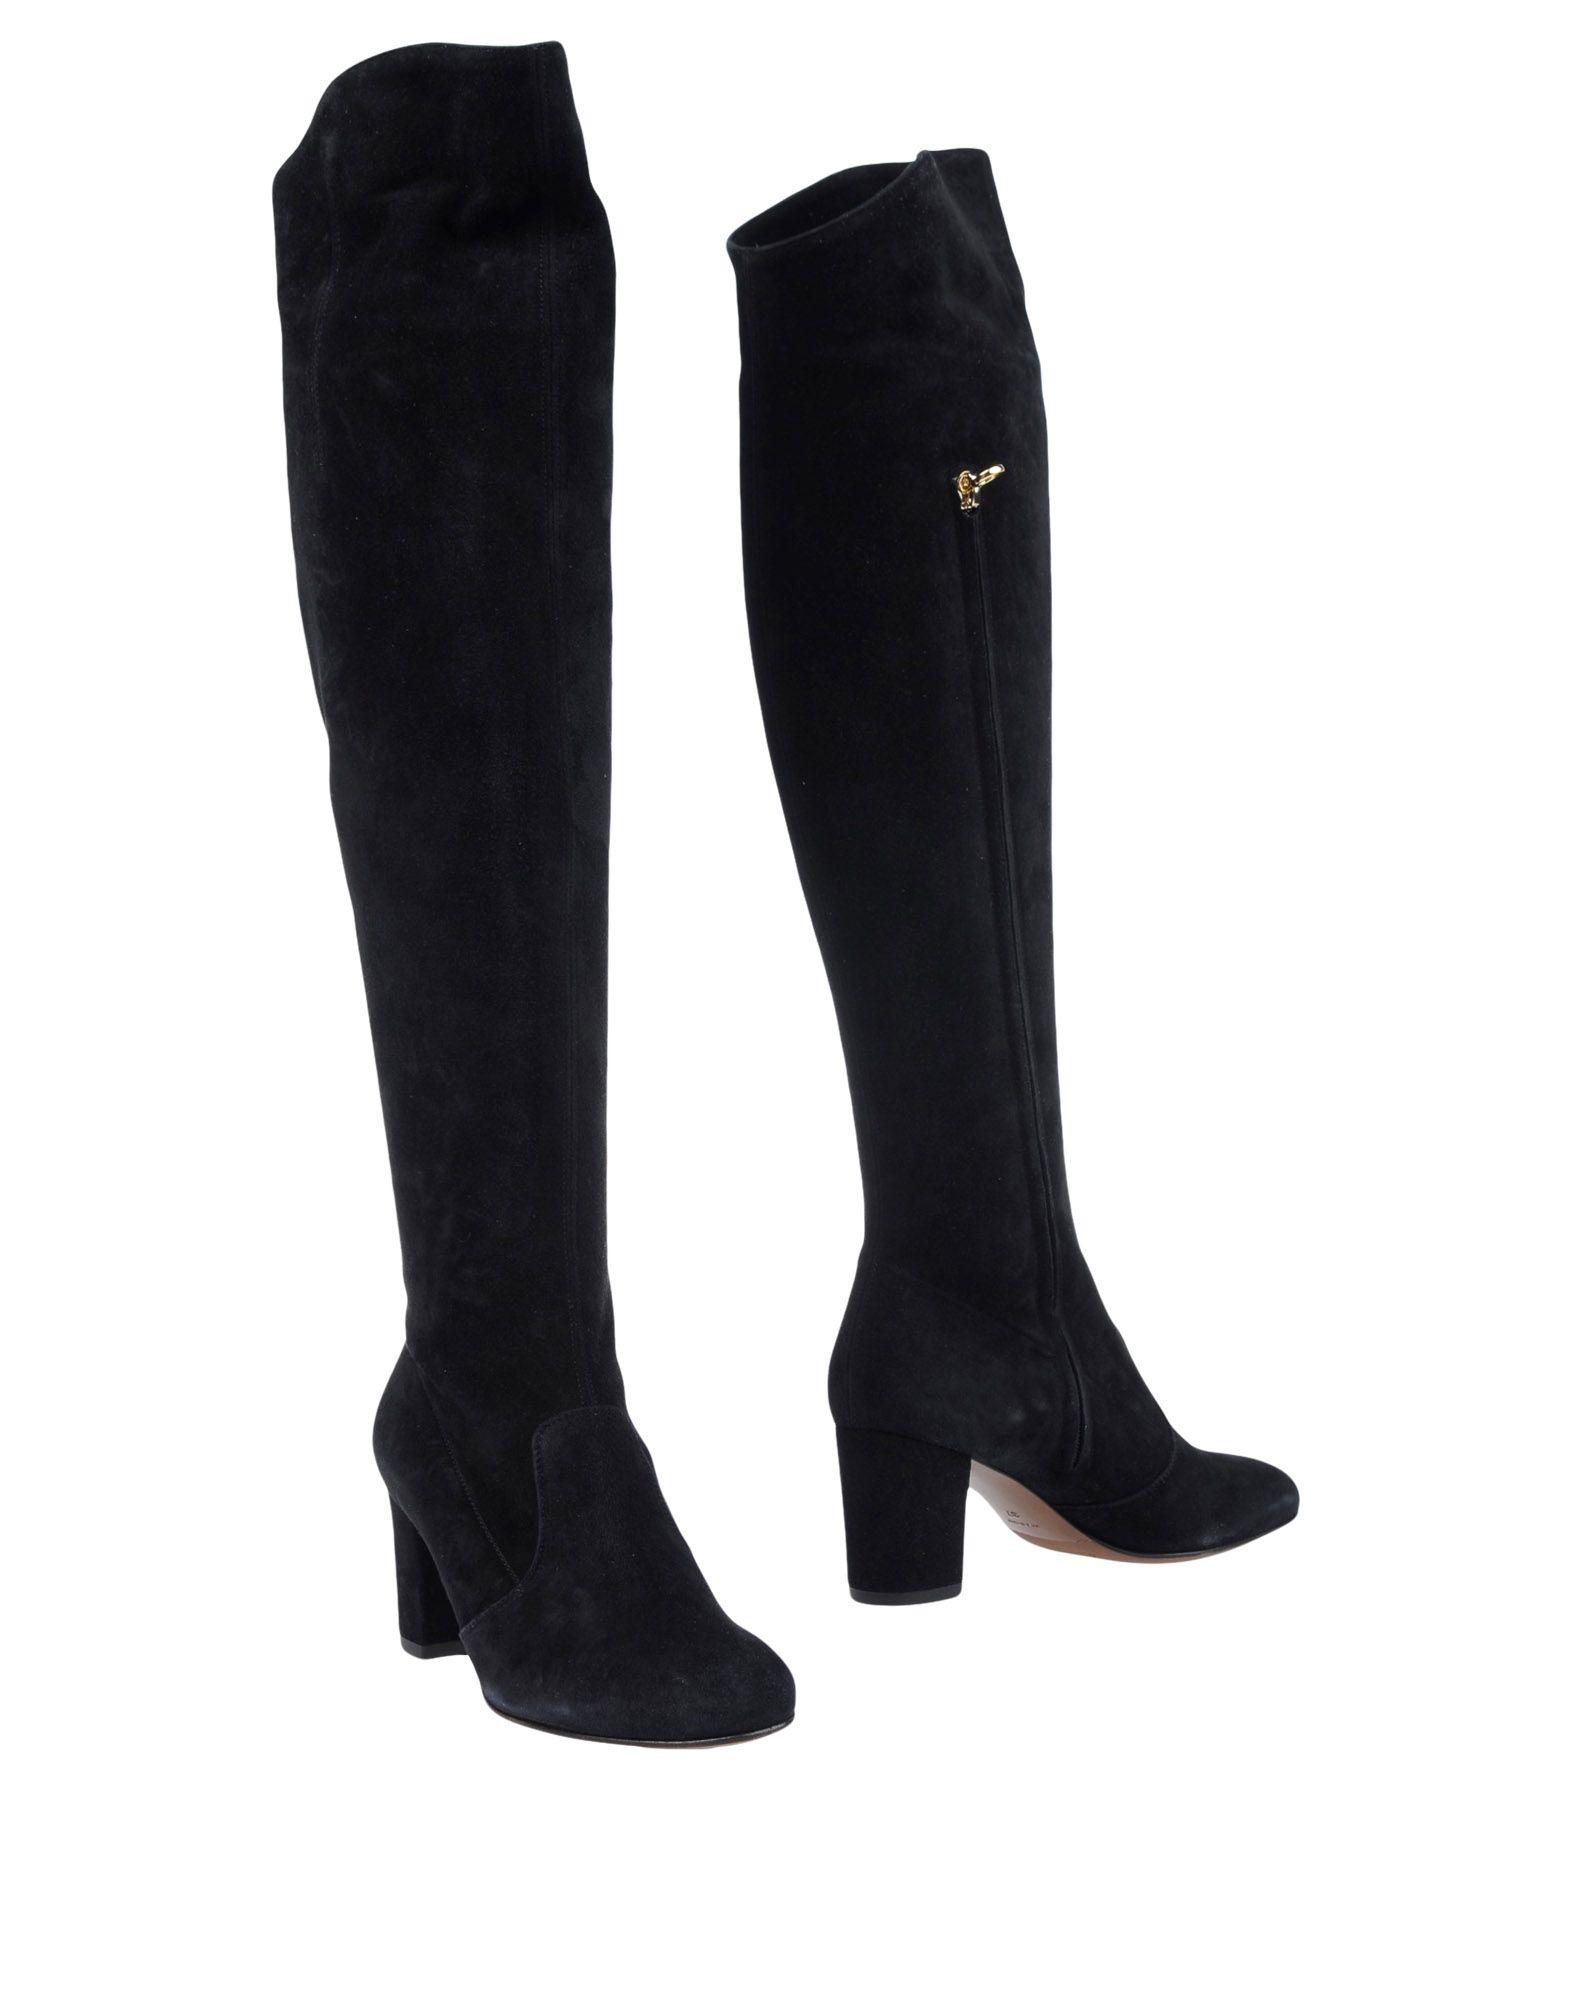 Rabatt Schuhe L' Autre Chose Stiefel Damen  11284881ED